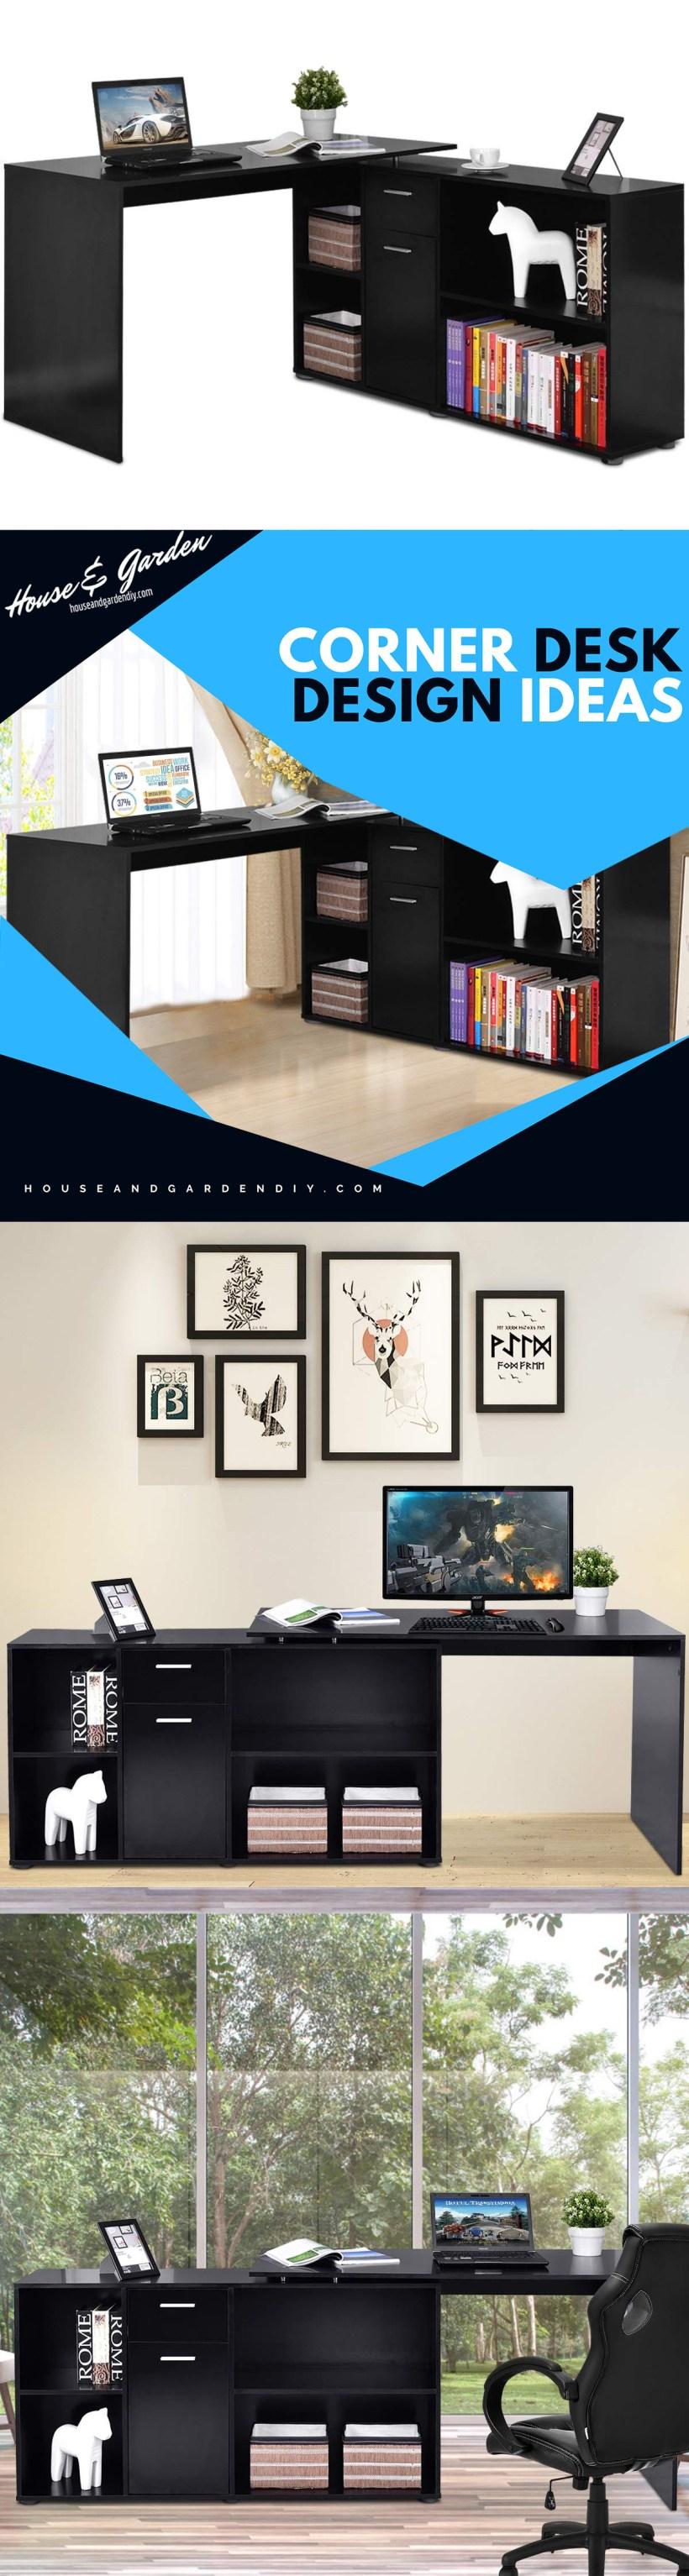 built in corner desk designs